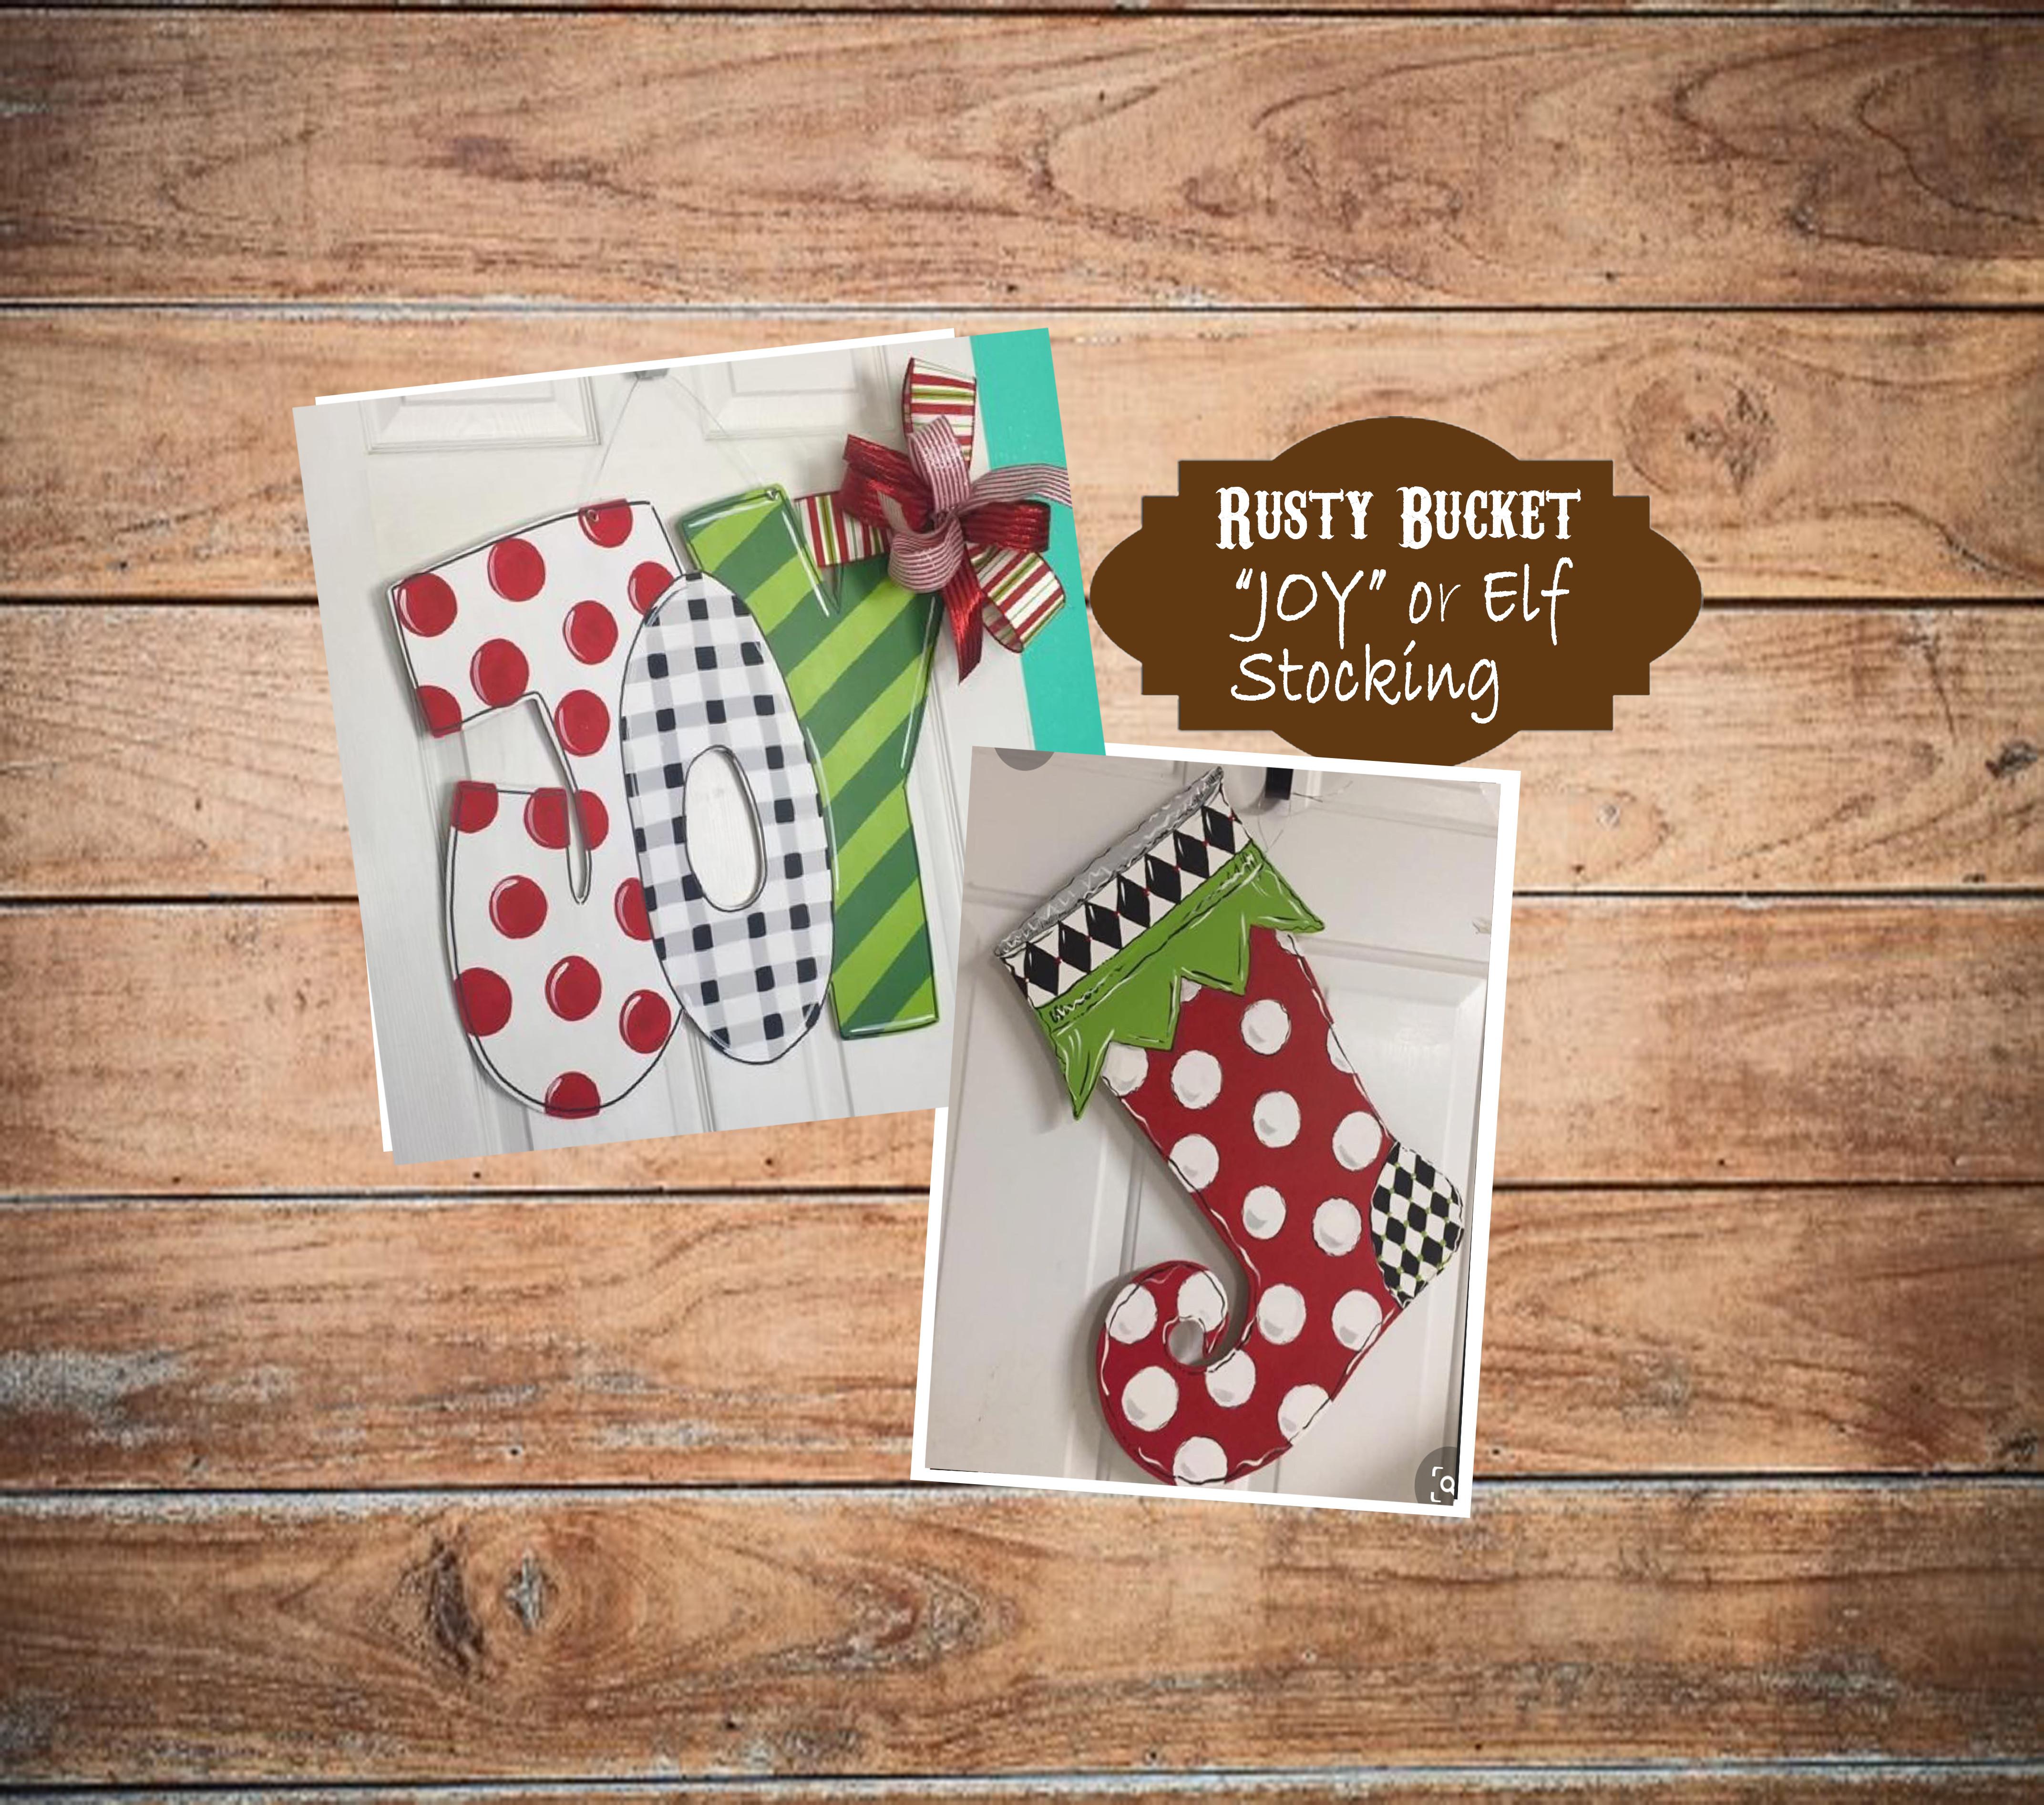 Elf Stocking or JOY | Dec 14